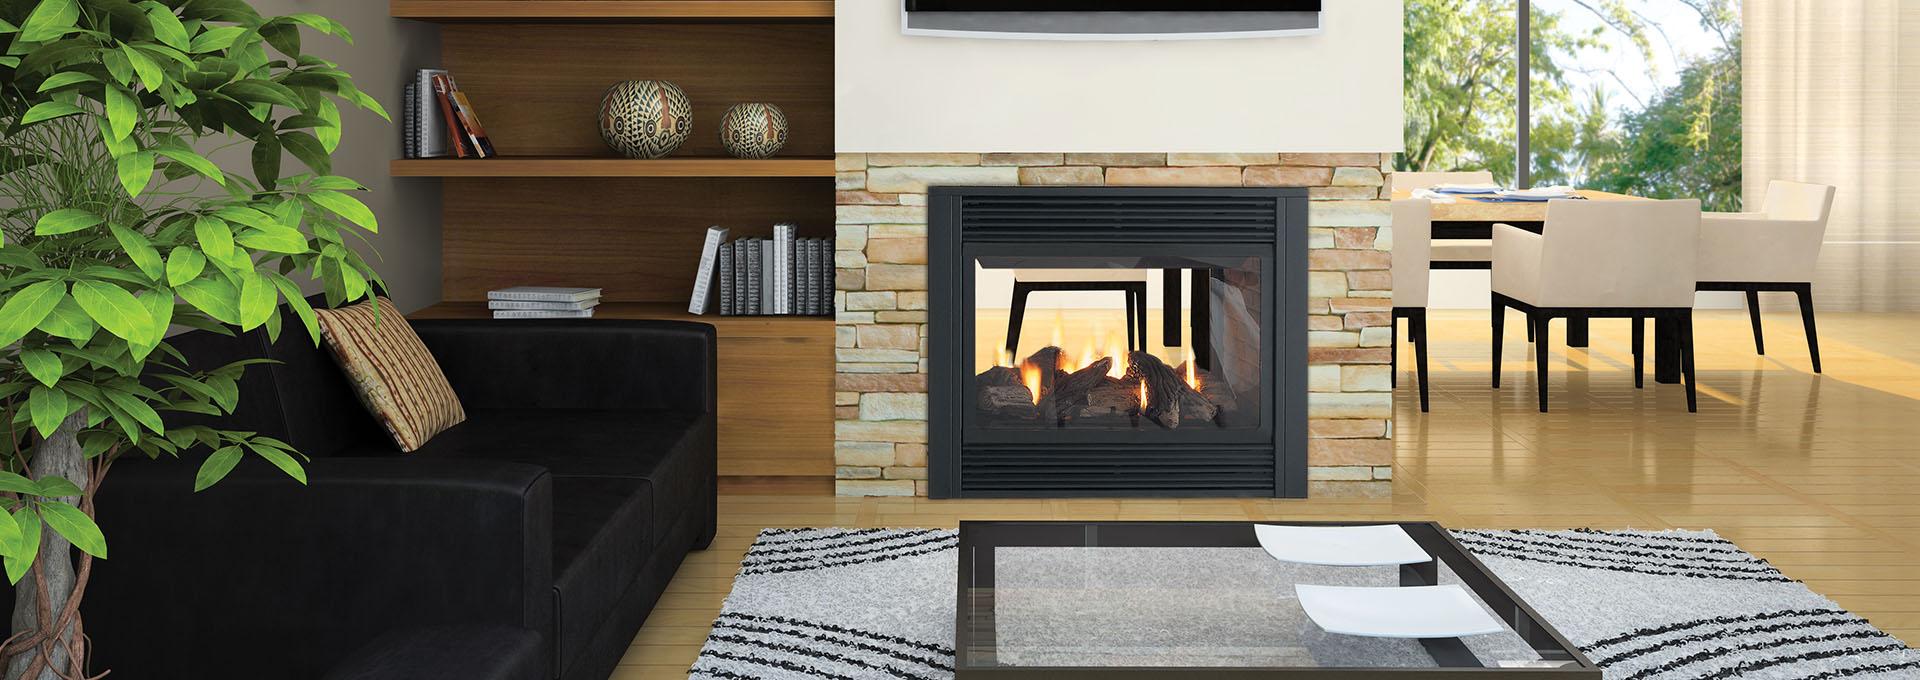 Regency Panorama See Through Direct Vent Gas Fireplace Colorado